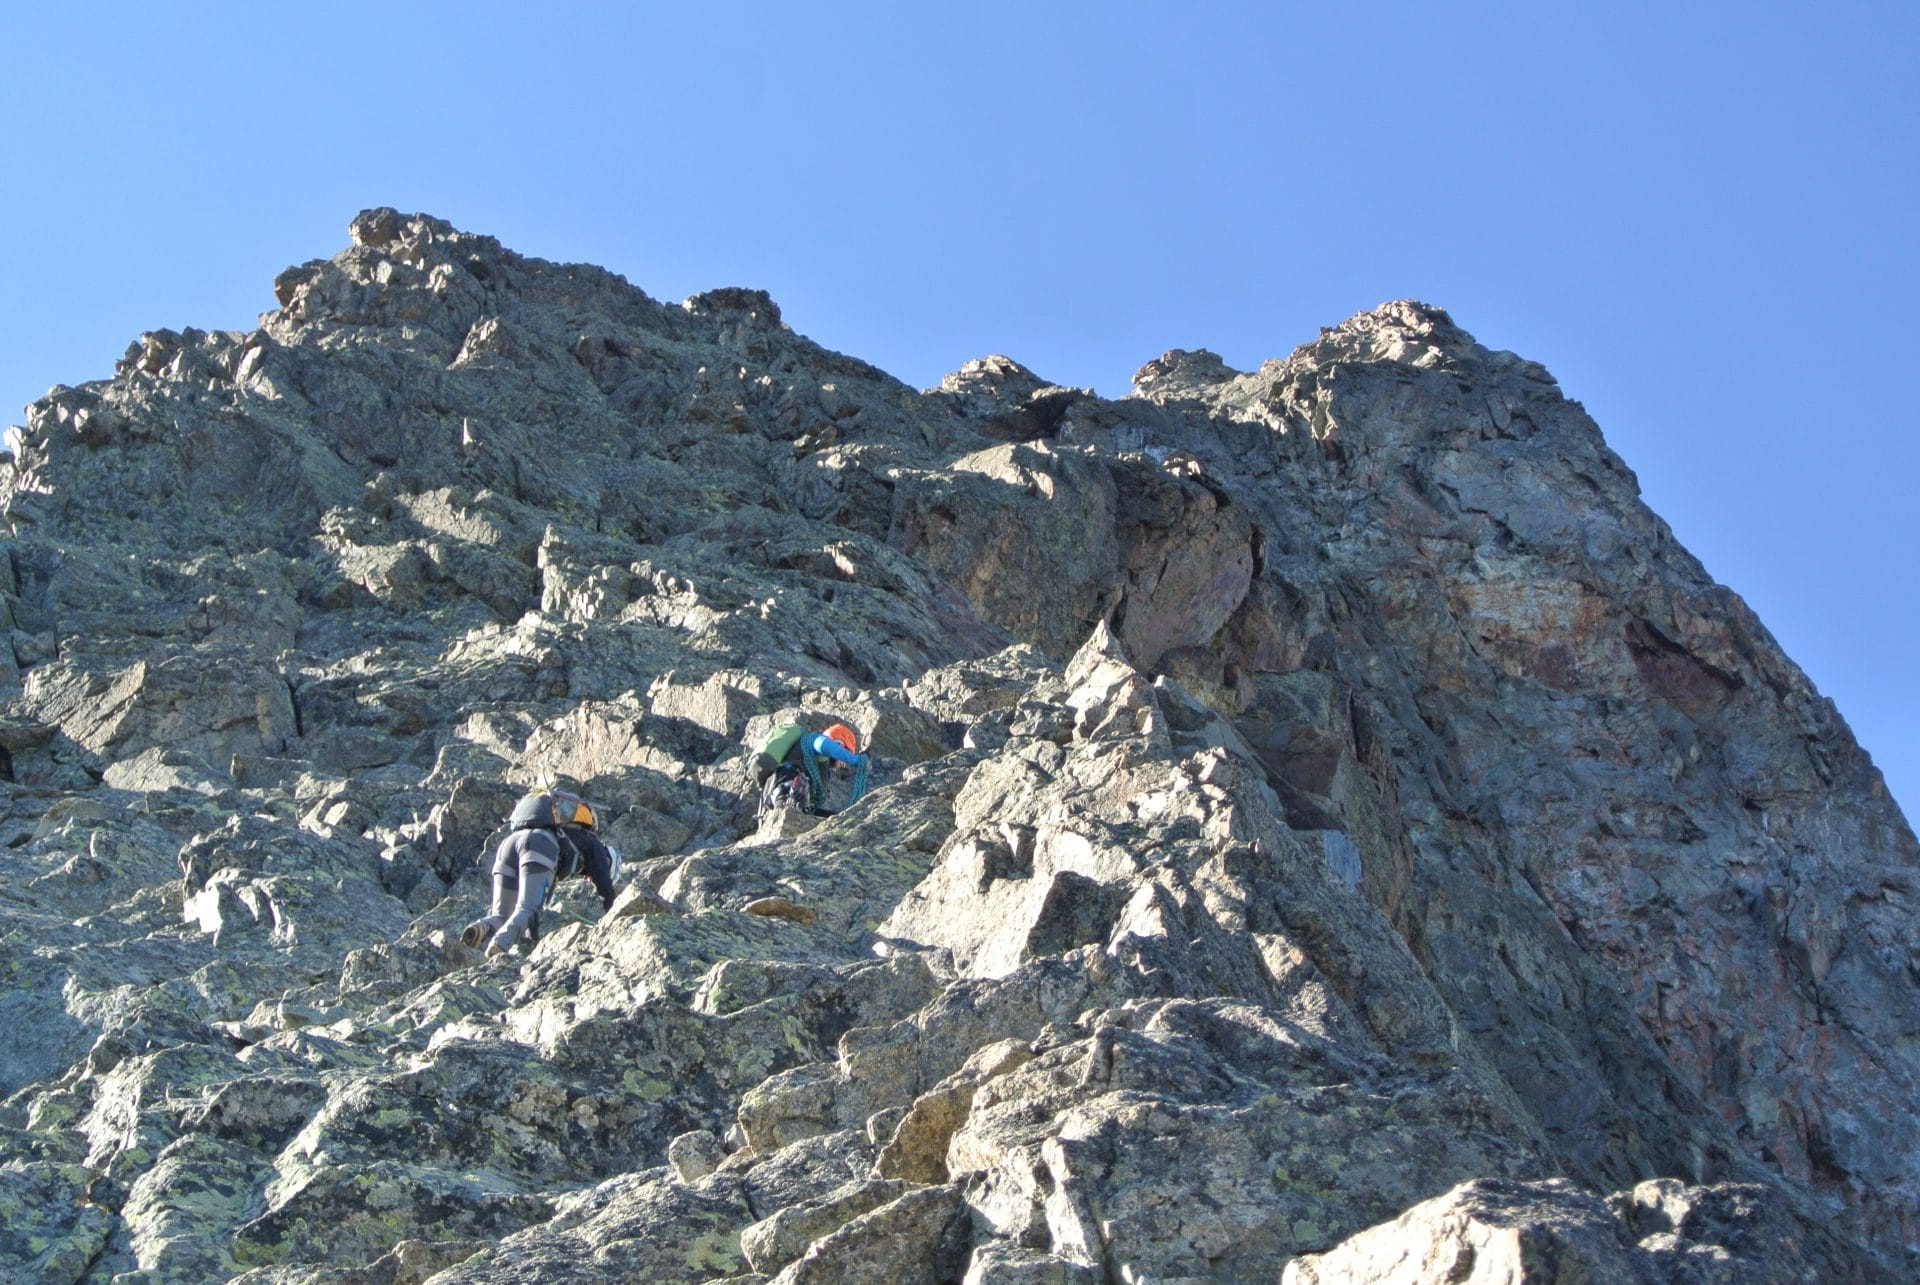 Helyum_arete-nord-sirac-valgaudemard_Alpinisme_xavier-carrard_France